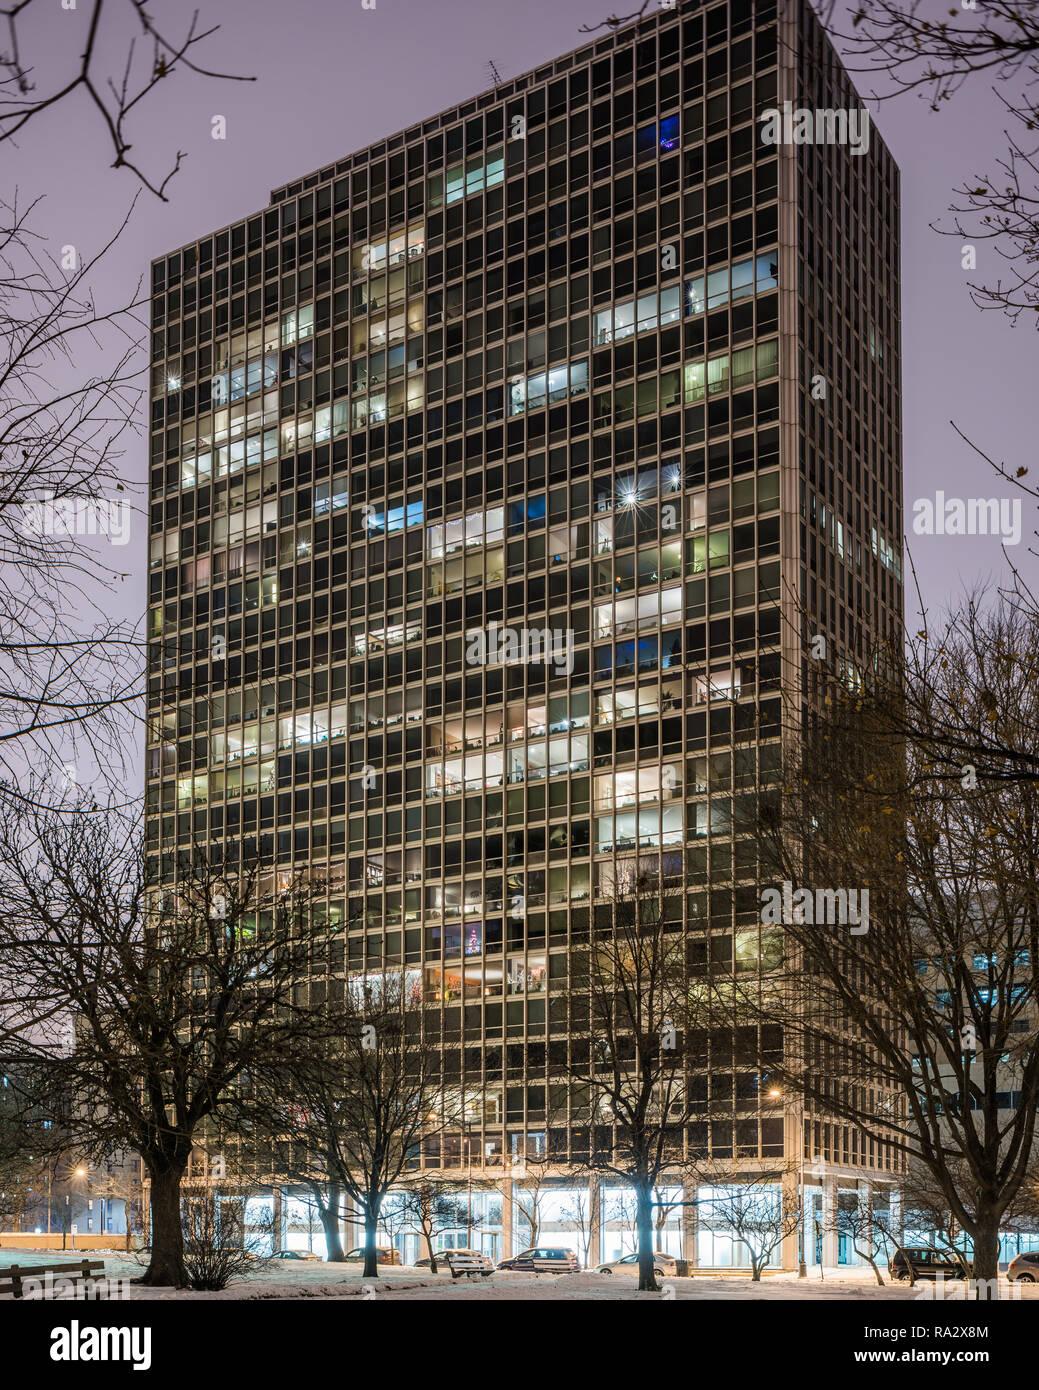 Chicago Mies Van Der Rohe Tour mies van der rohe chicago stock photos & mies van der rohe